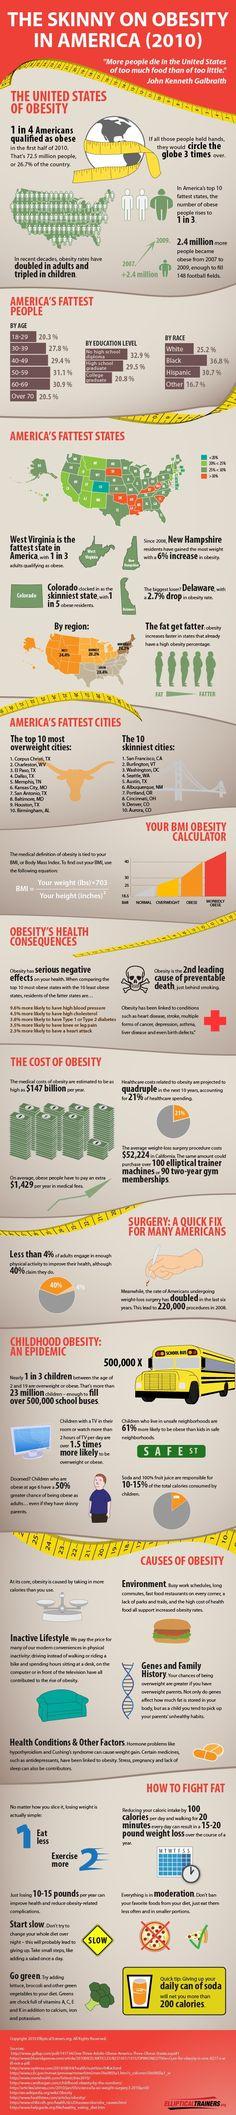 12 Best Obesity Statistics images in 2014 | Health, wellness, Health